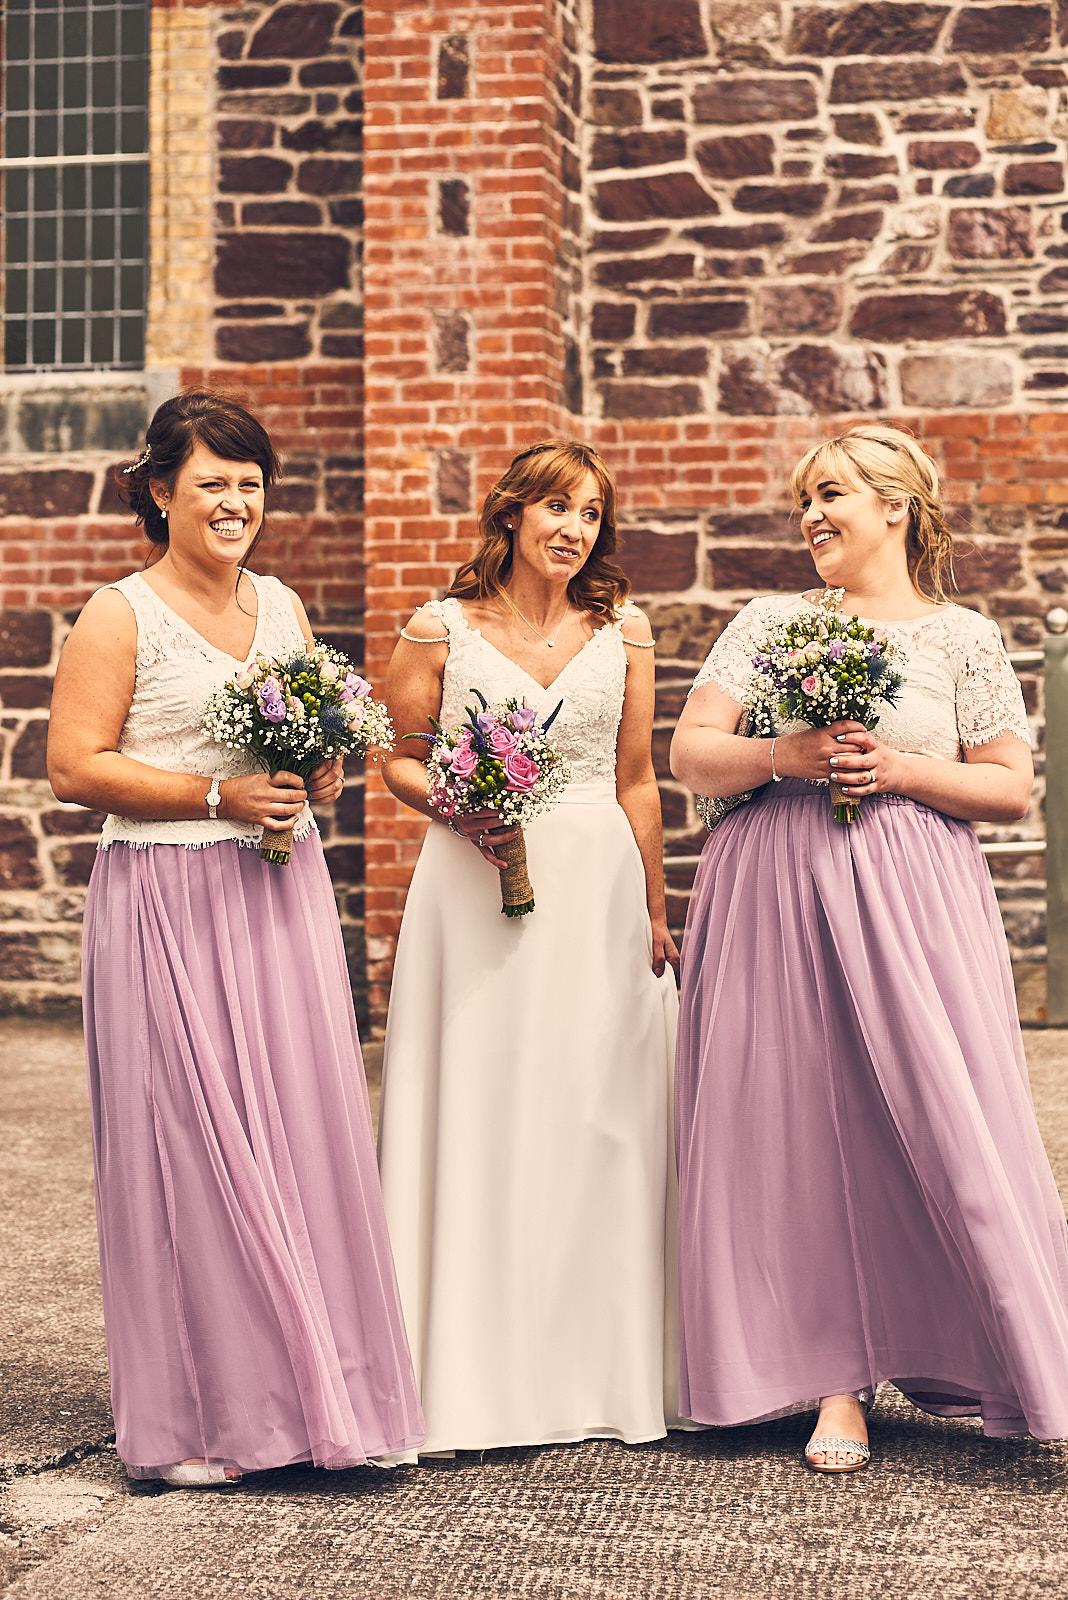 Destination Wedding Photography in Ireland Pristine View Photography - Wedding Photographer Bedfordshire, Hertfordshire, London and surrounding areas.